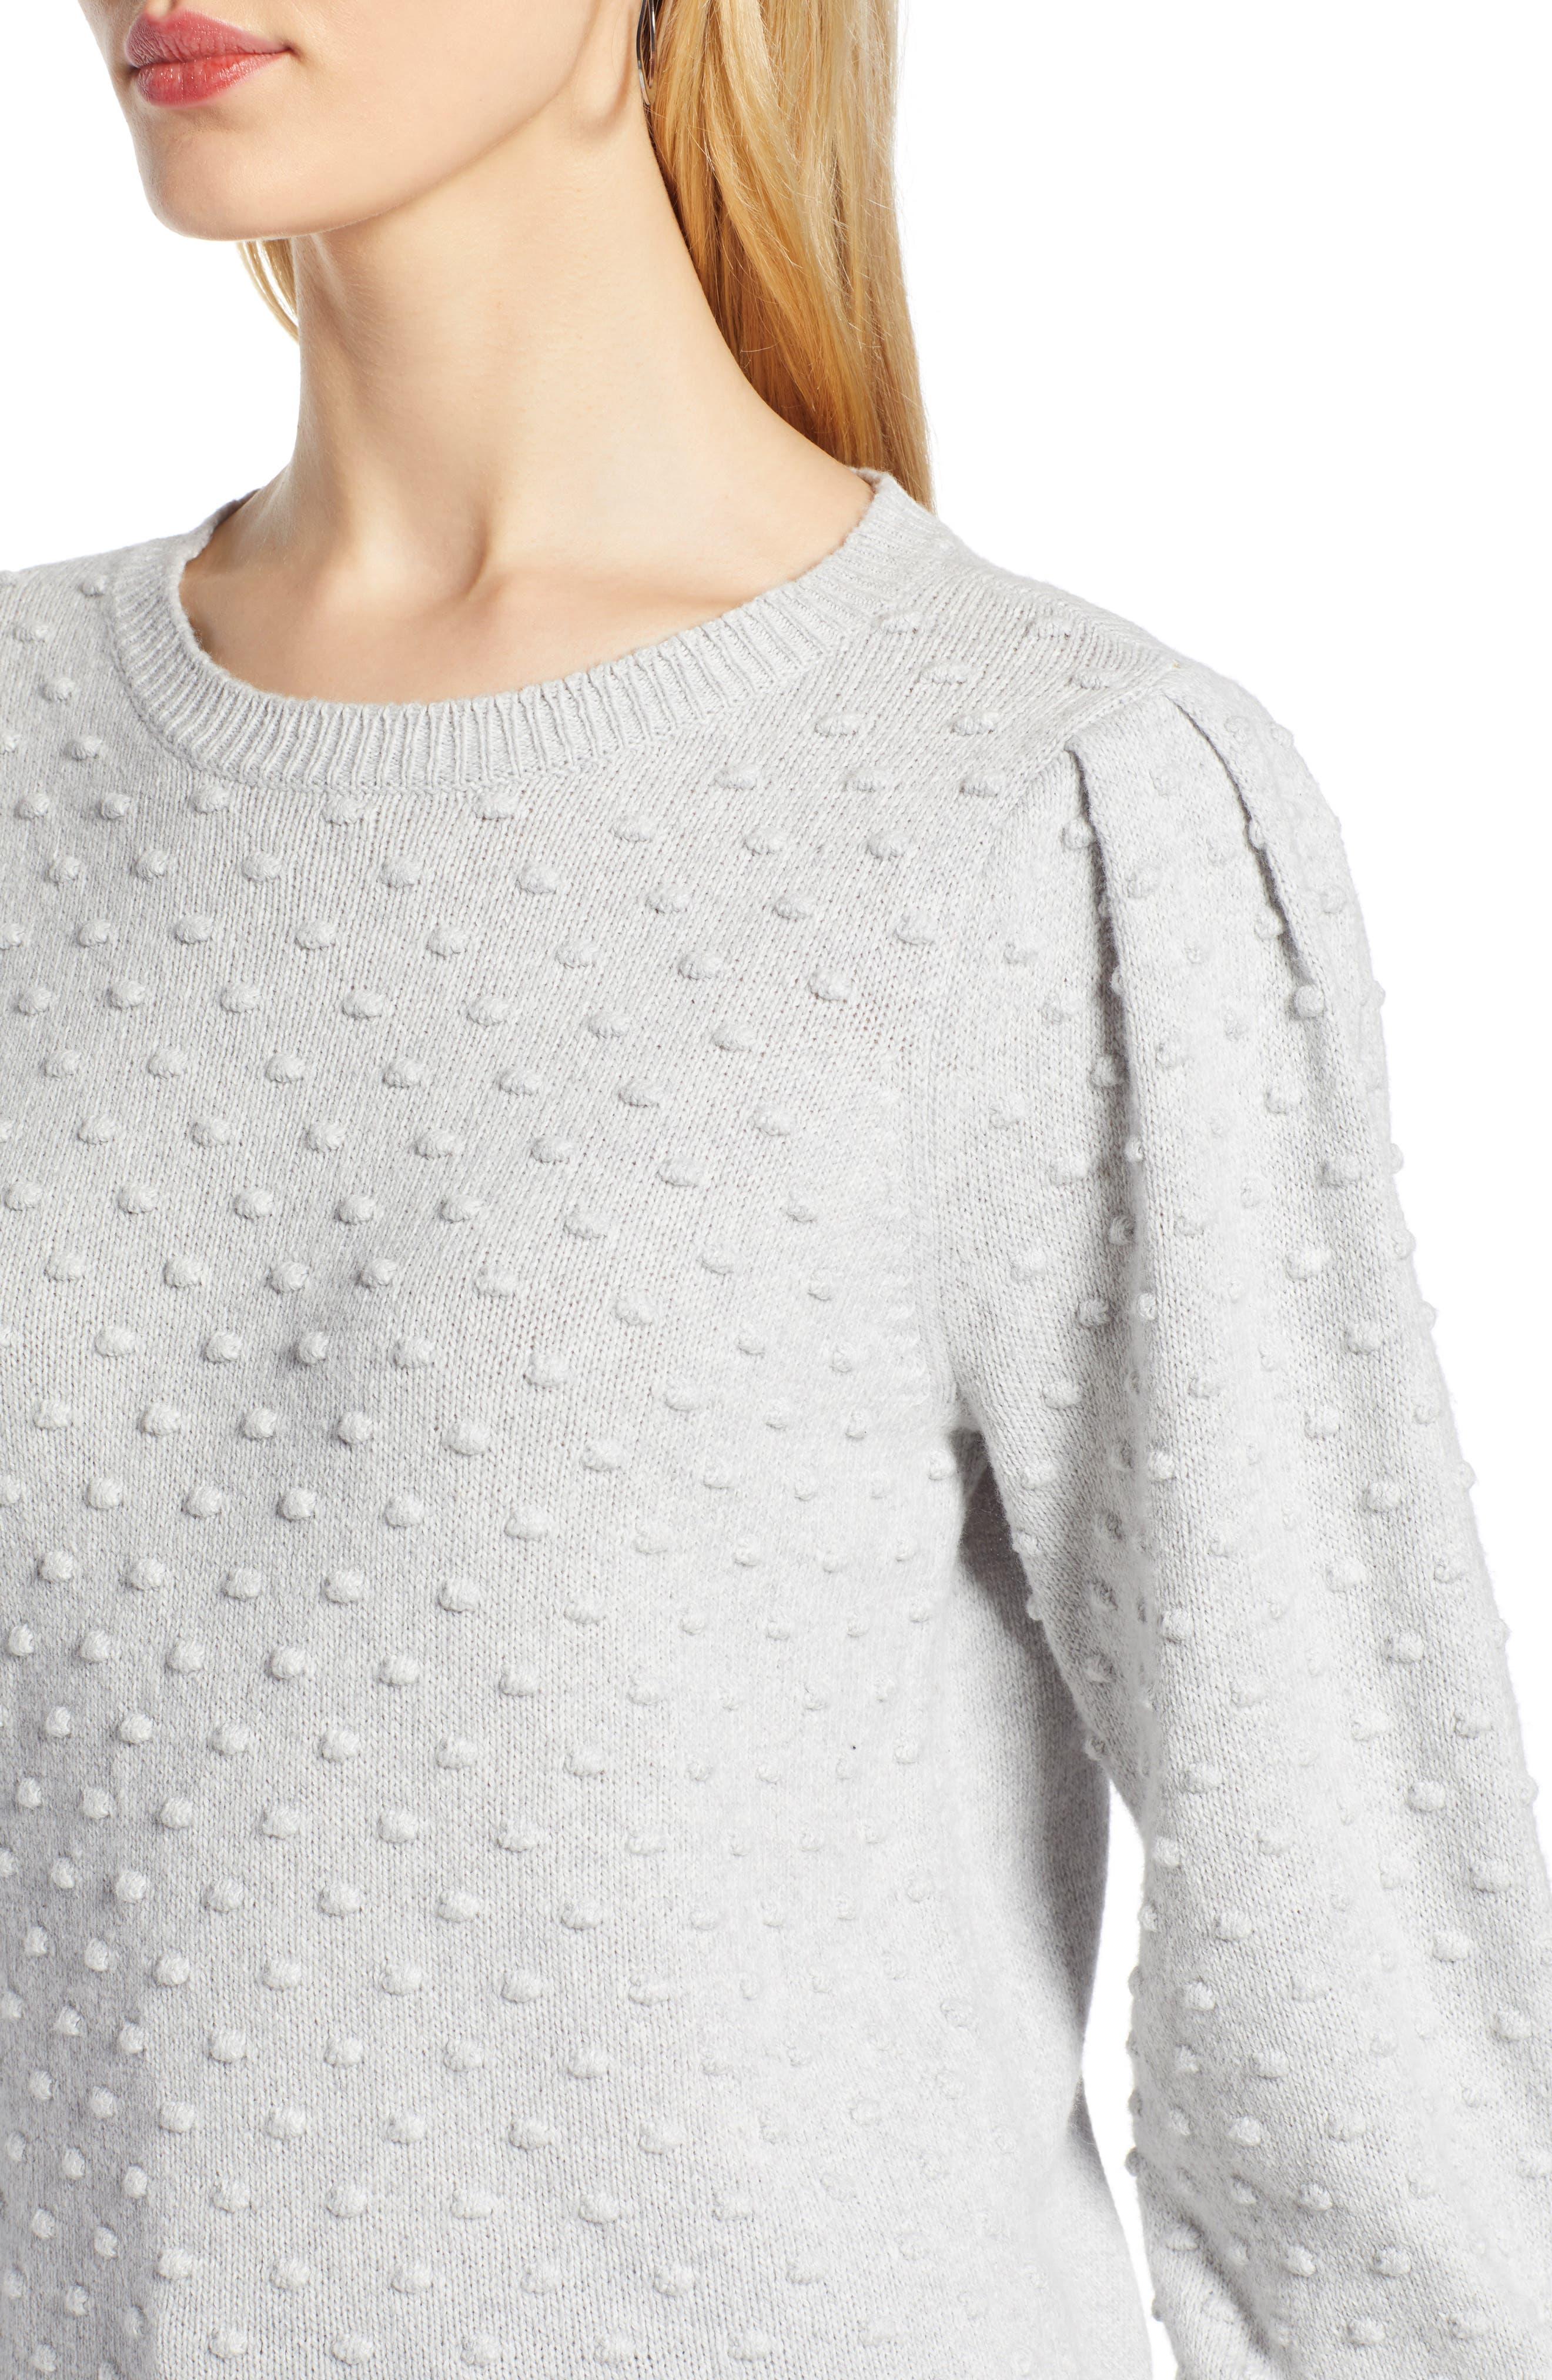 Bobble Stitch Sweater,                             Alternate thumbnail 4, color,                             GREY LIGHT HEATHER